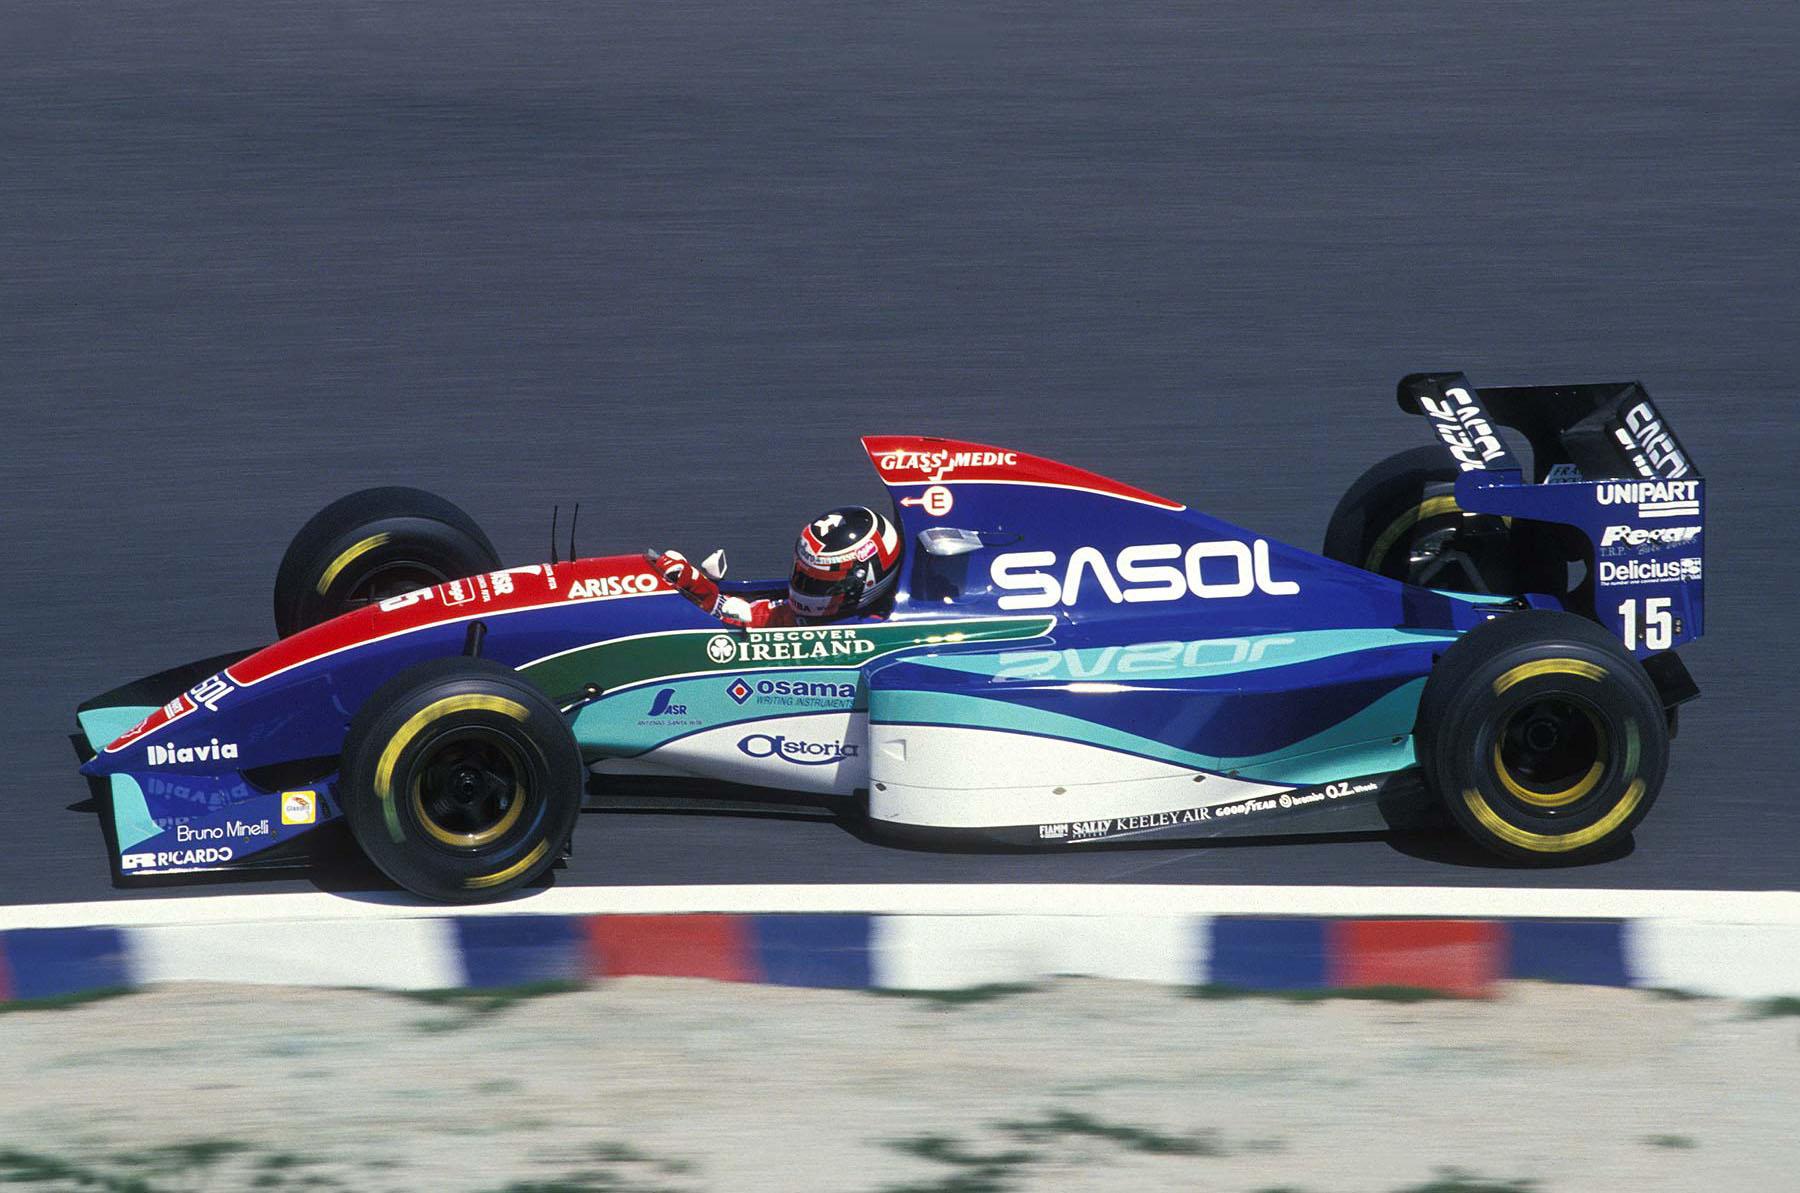 Jordan, equipe historica de Formula 1 de 1994 - bandeiraverde.com.br